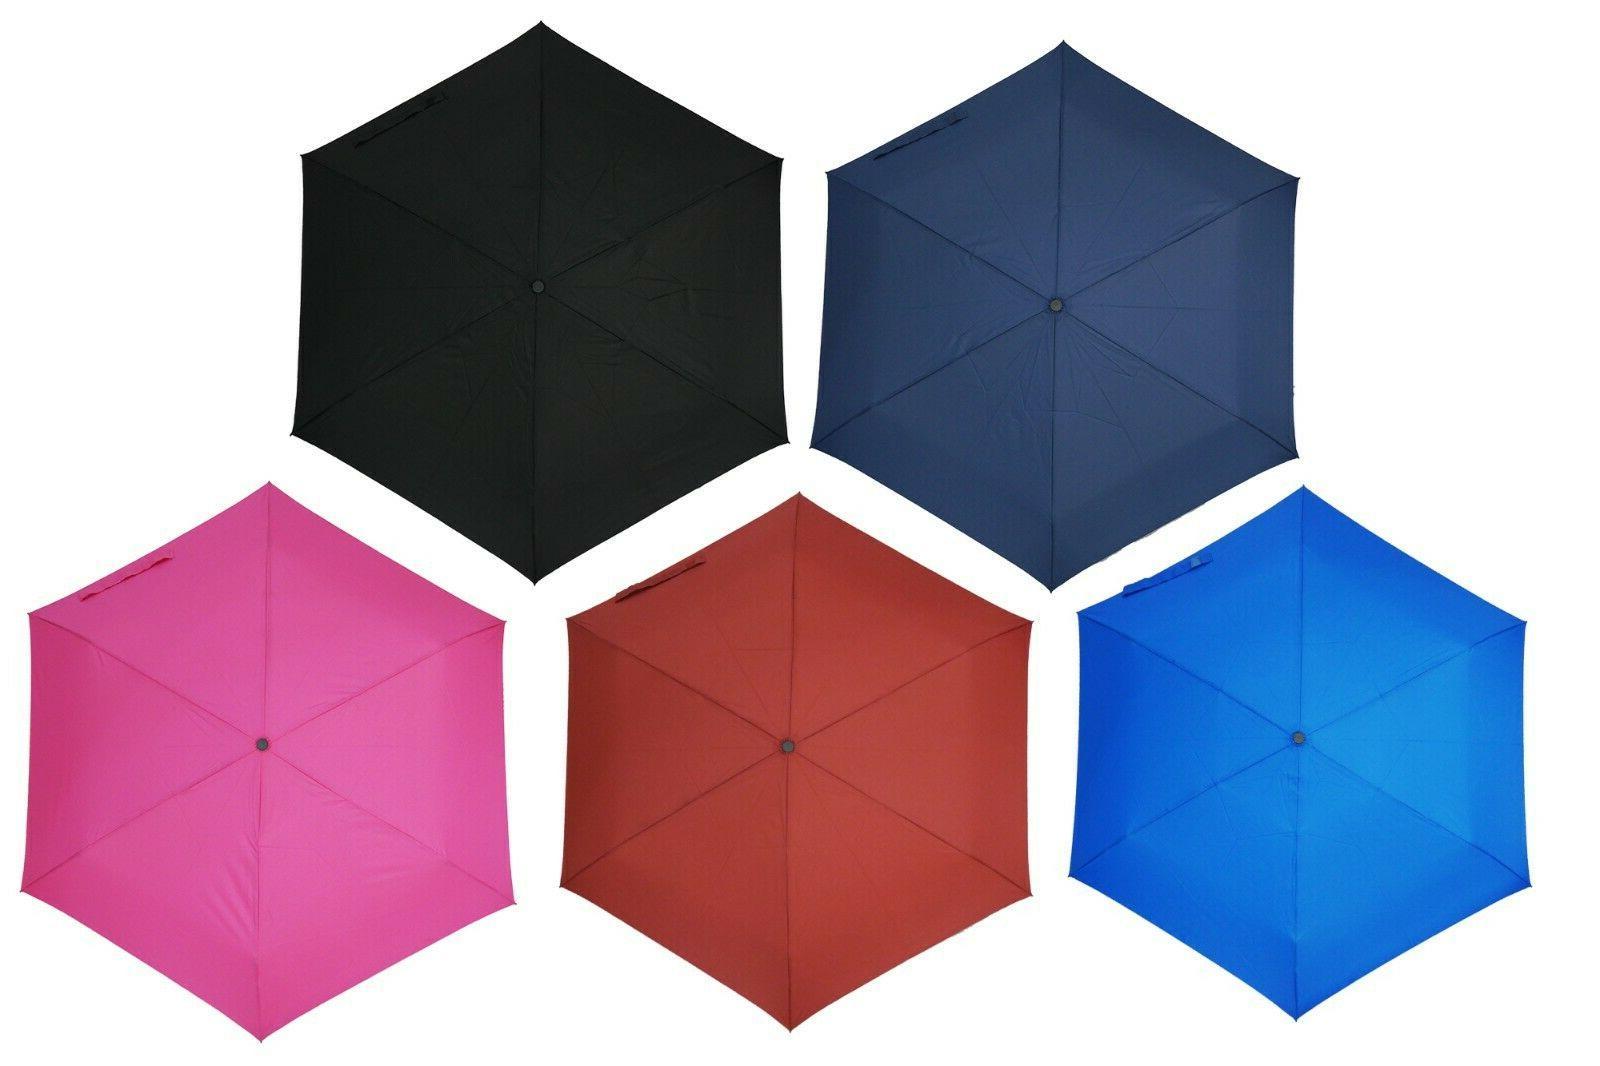 KUD Lightweight Compact travel umbrella with 50 inch Arc lar